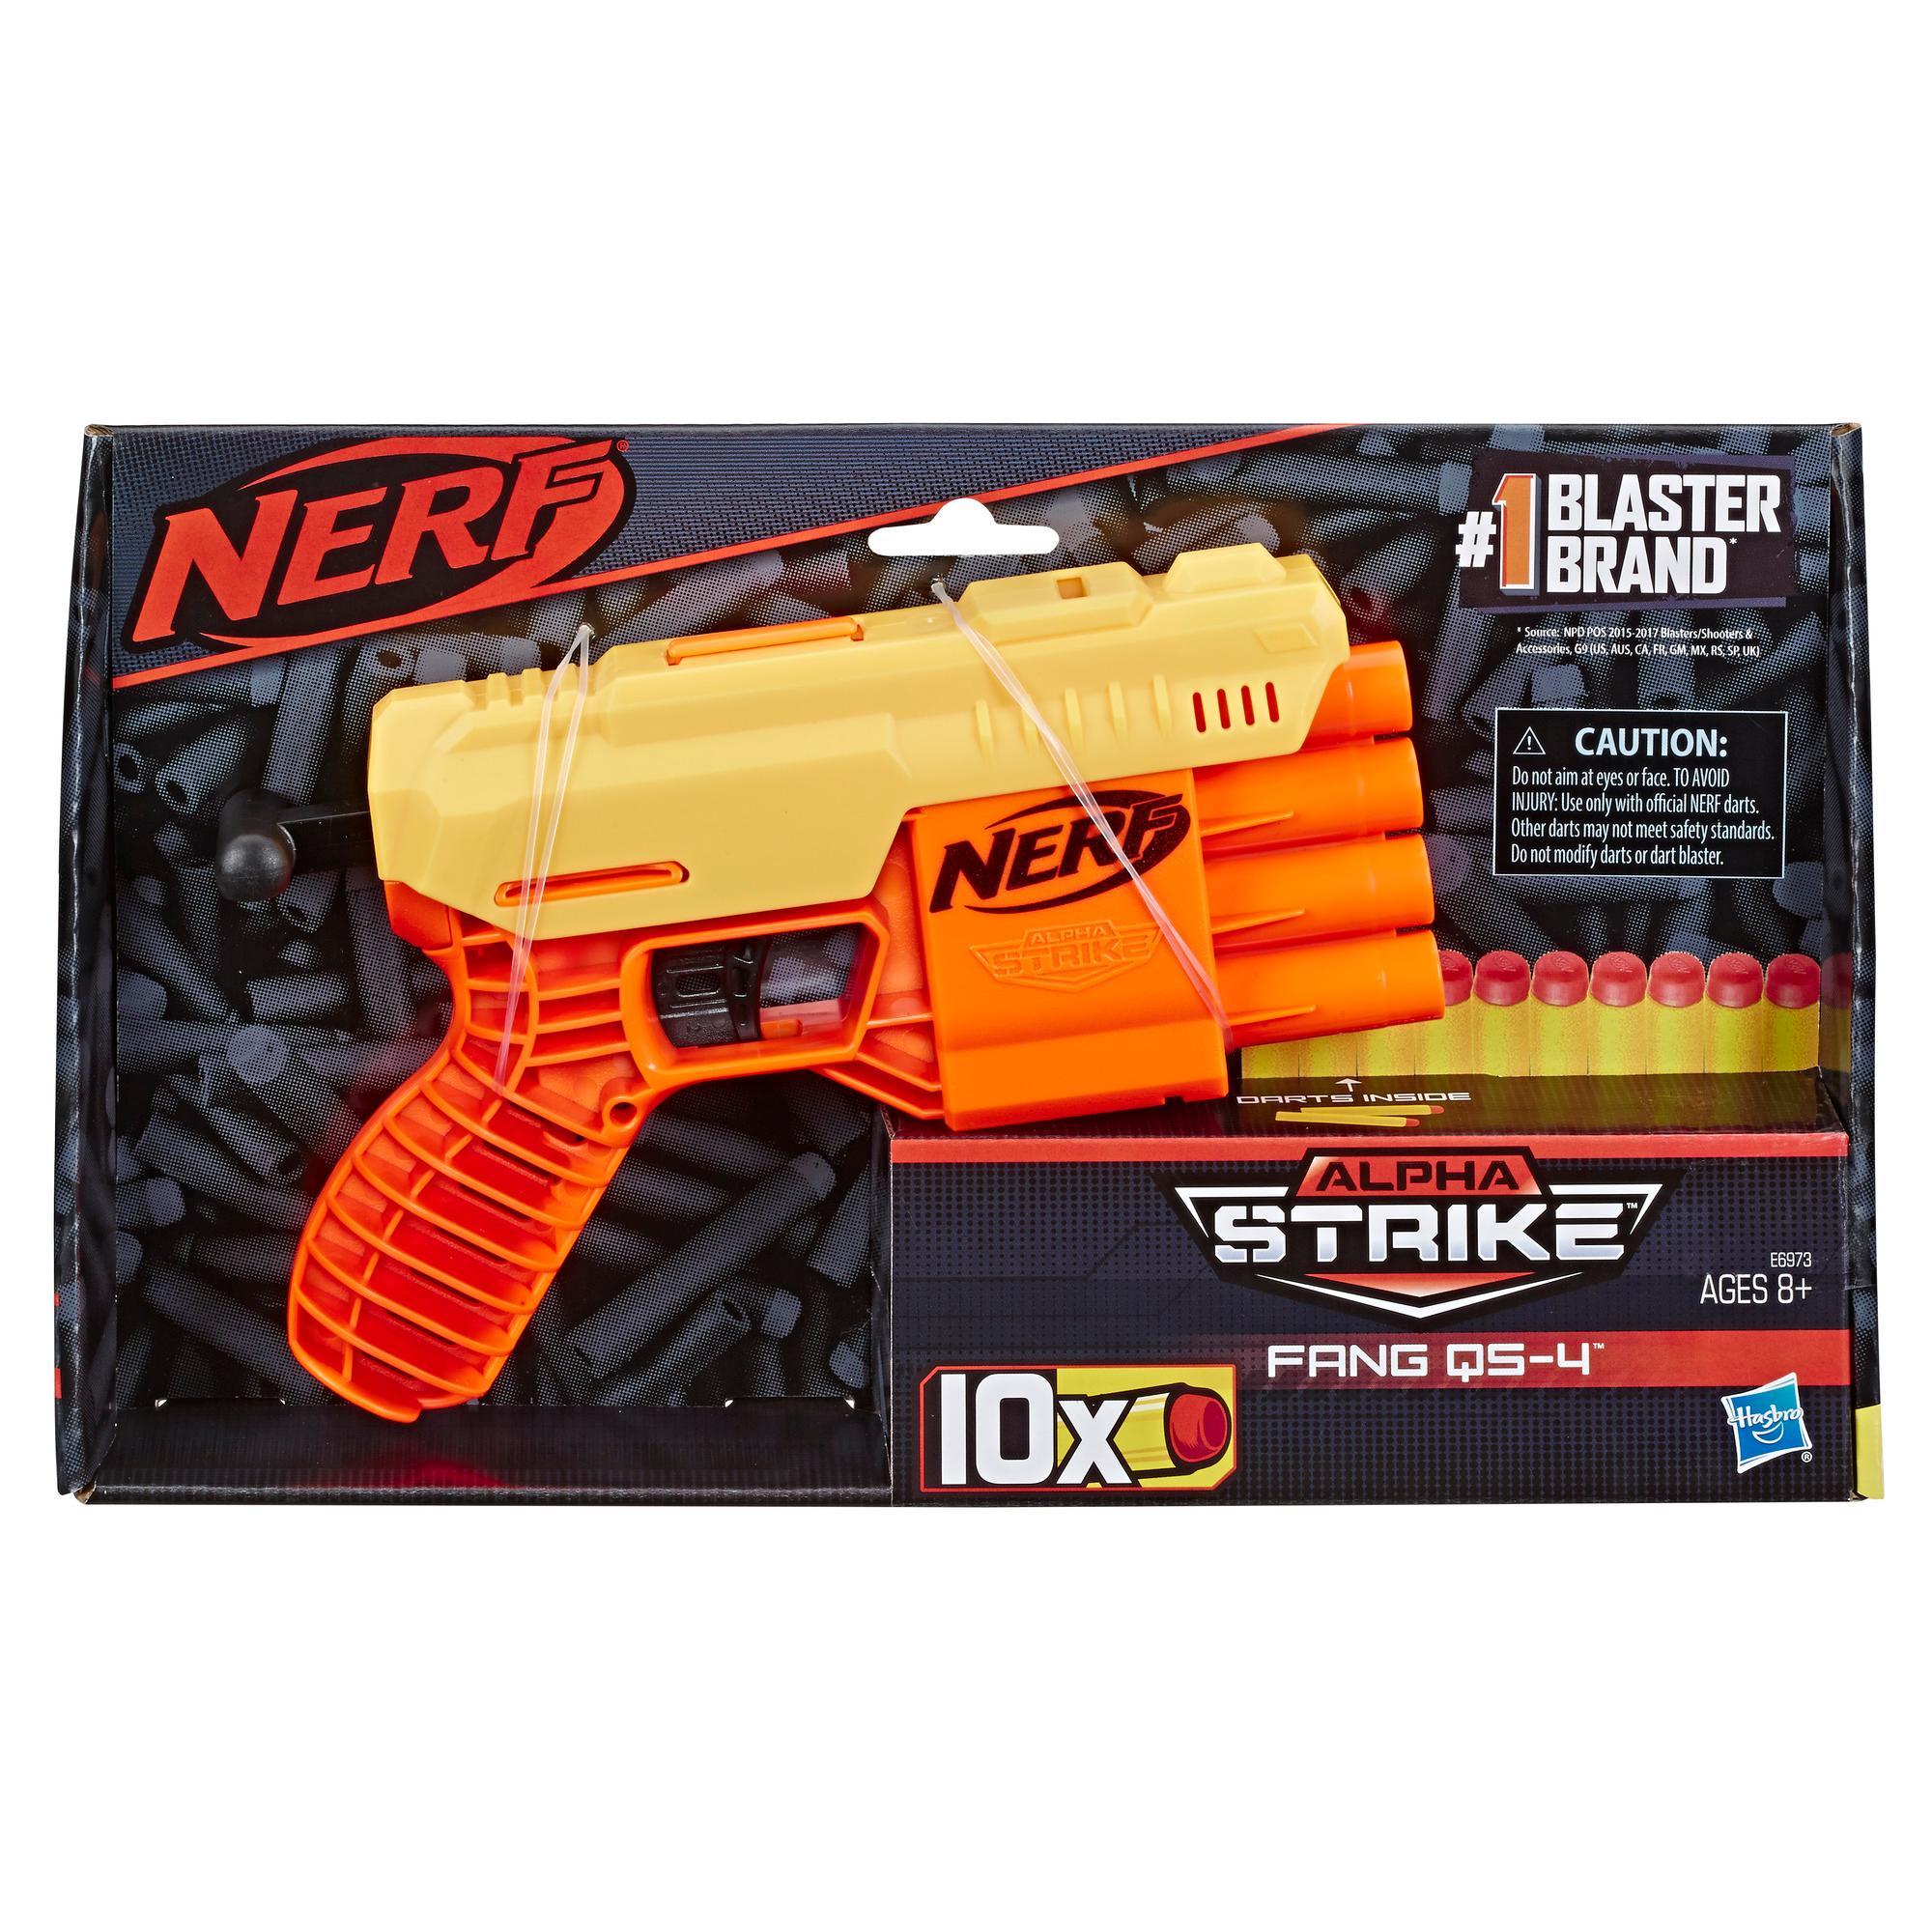 Foudroyeur jouet Fang QS-4 Nerf Alpha Strike